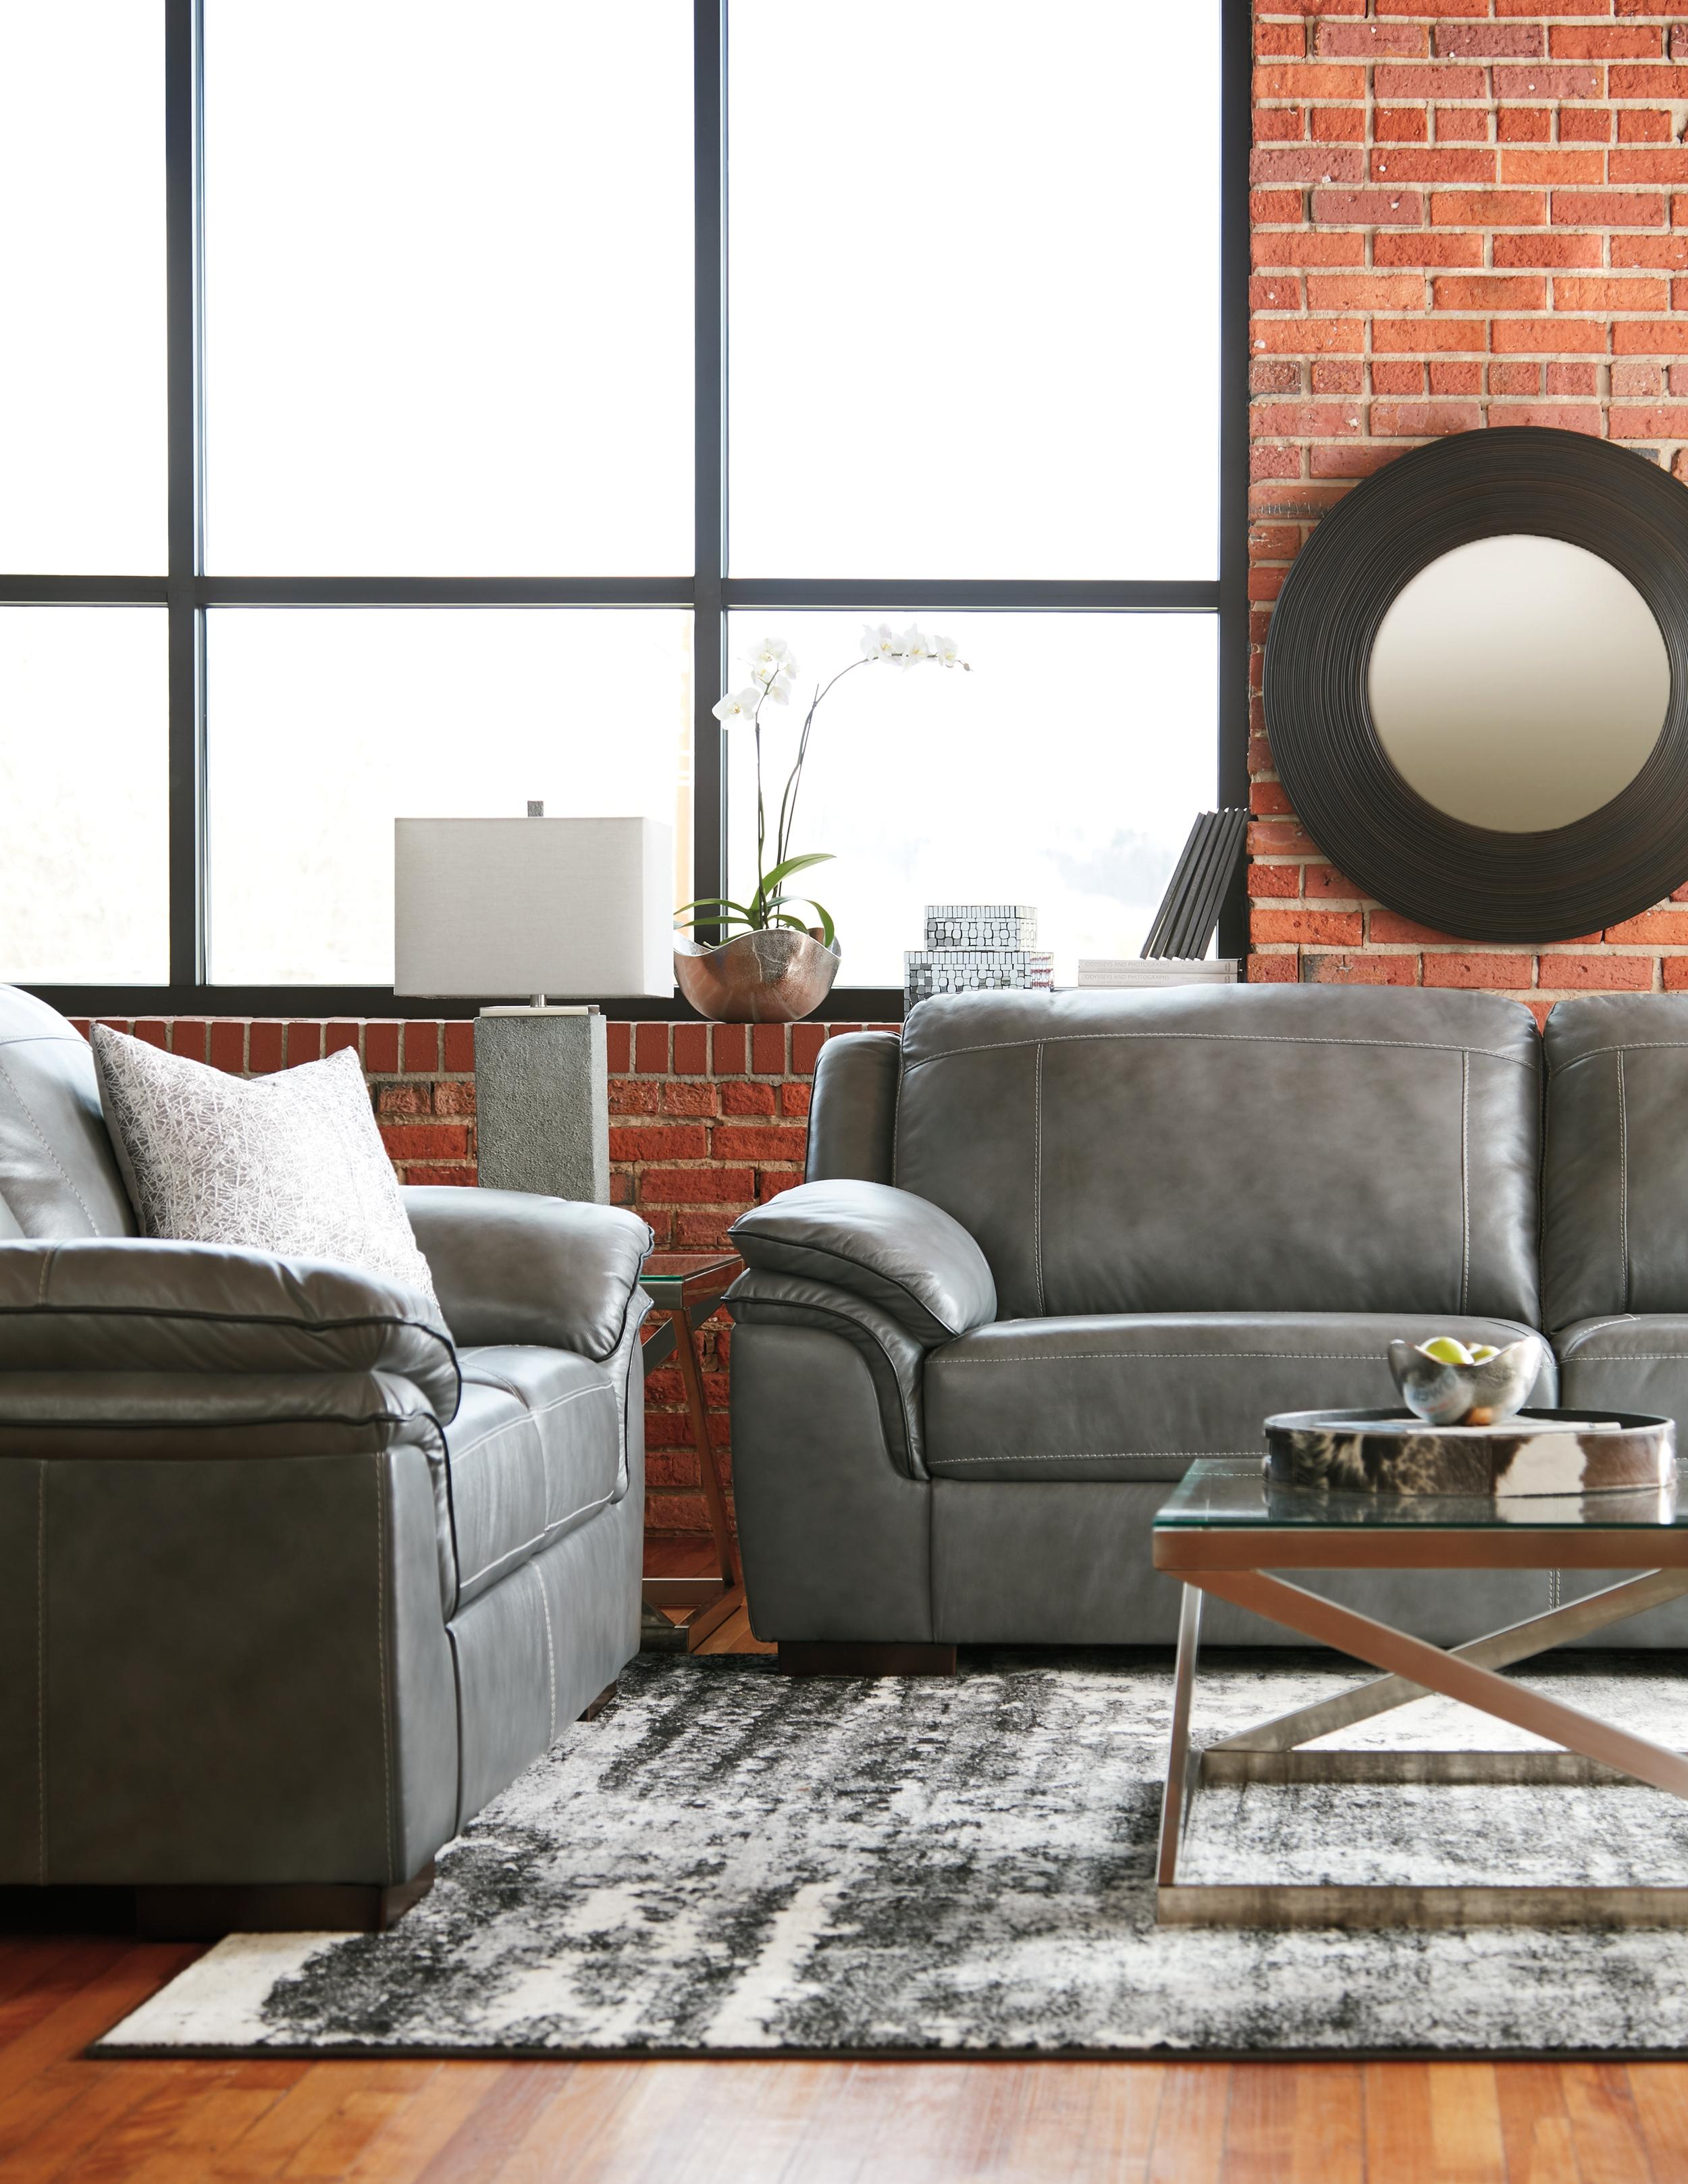 Admirable Islebrook Sofa In 2019 Products Living Room Sofa Sofa Spiritservingveterans Wood Chair Design Ideas Spiritservingveteransorg